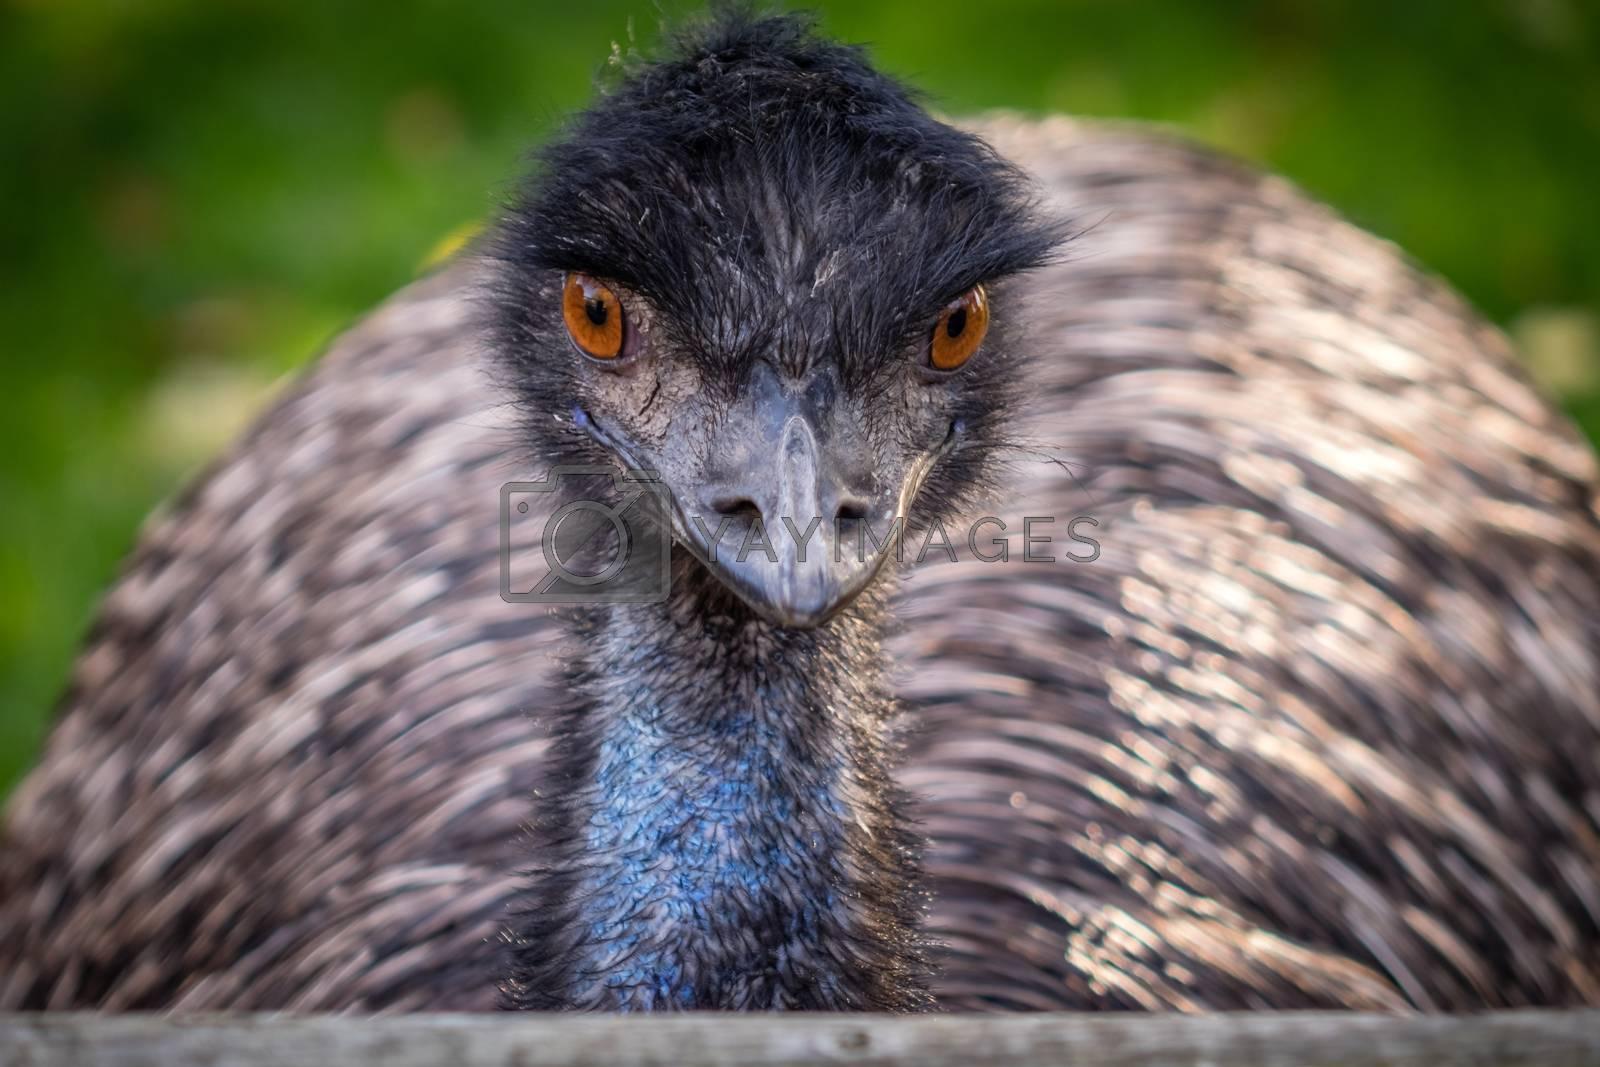 Closeup portrait of a large Emu (Dromaius novaehollandiae) bird